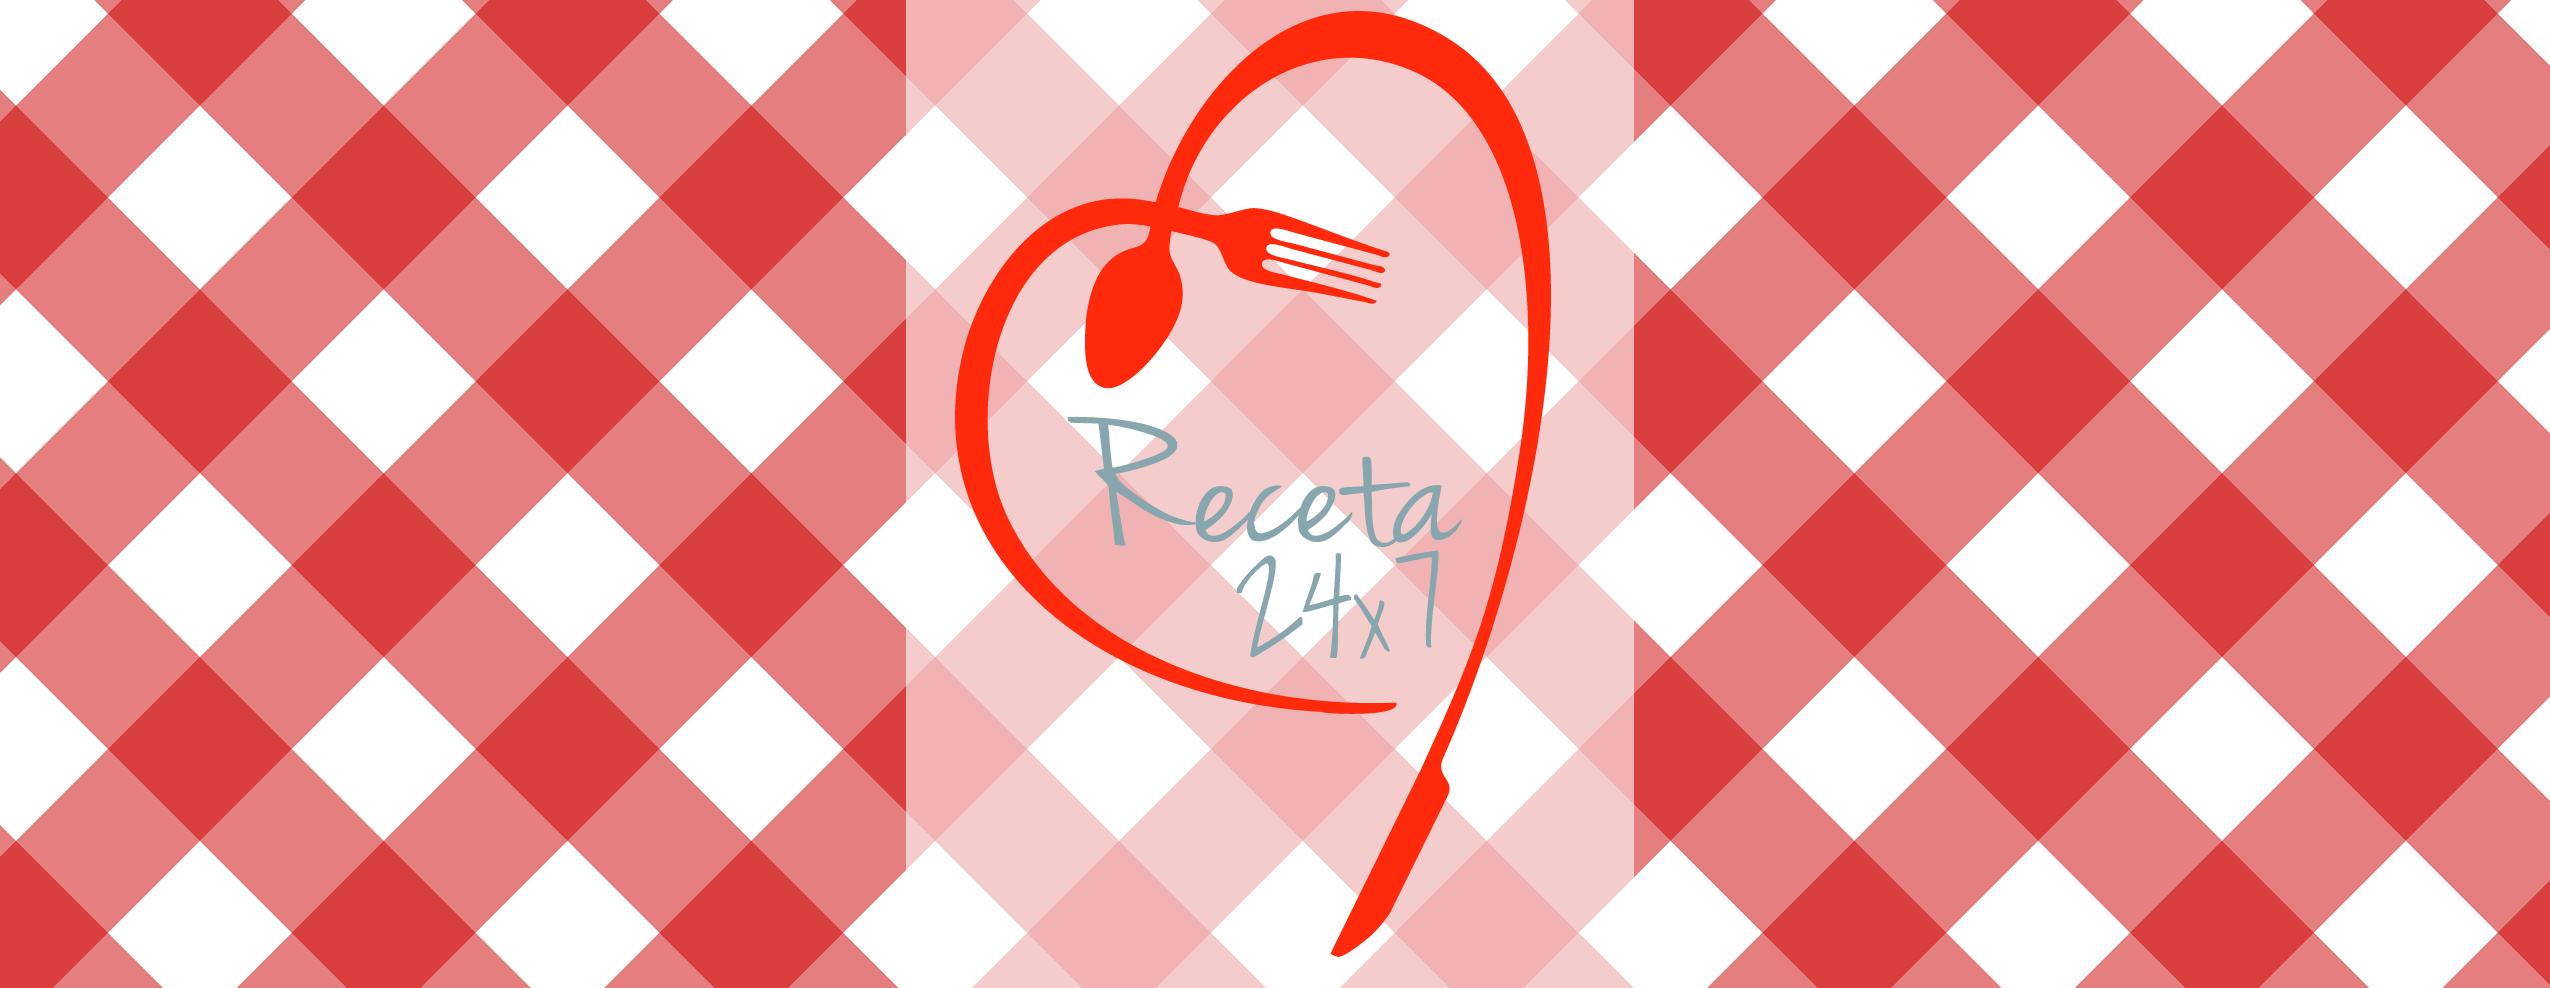 Receta24x7